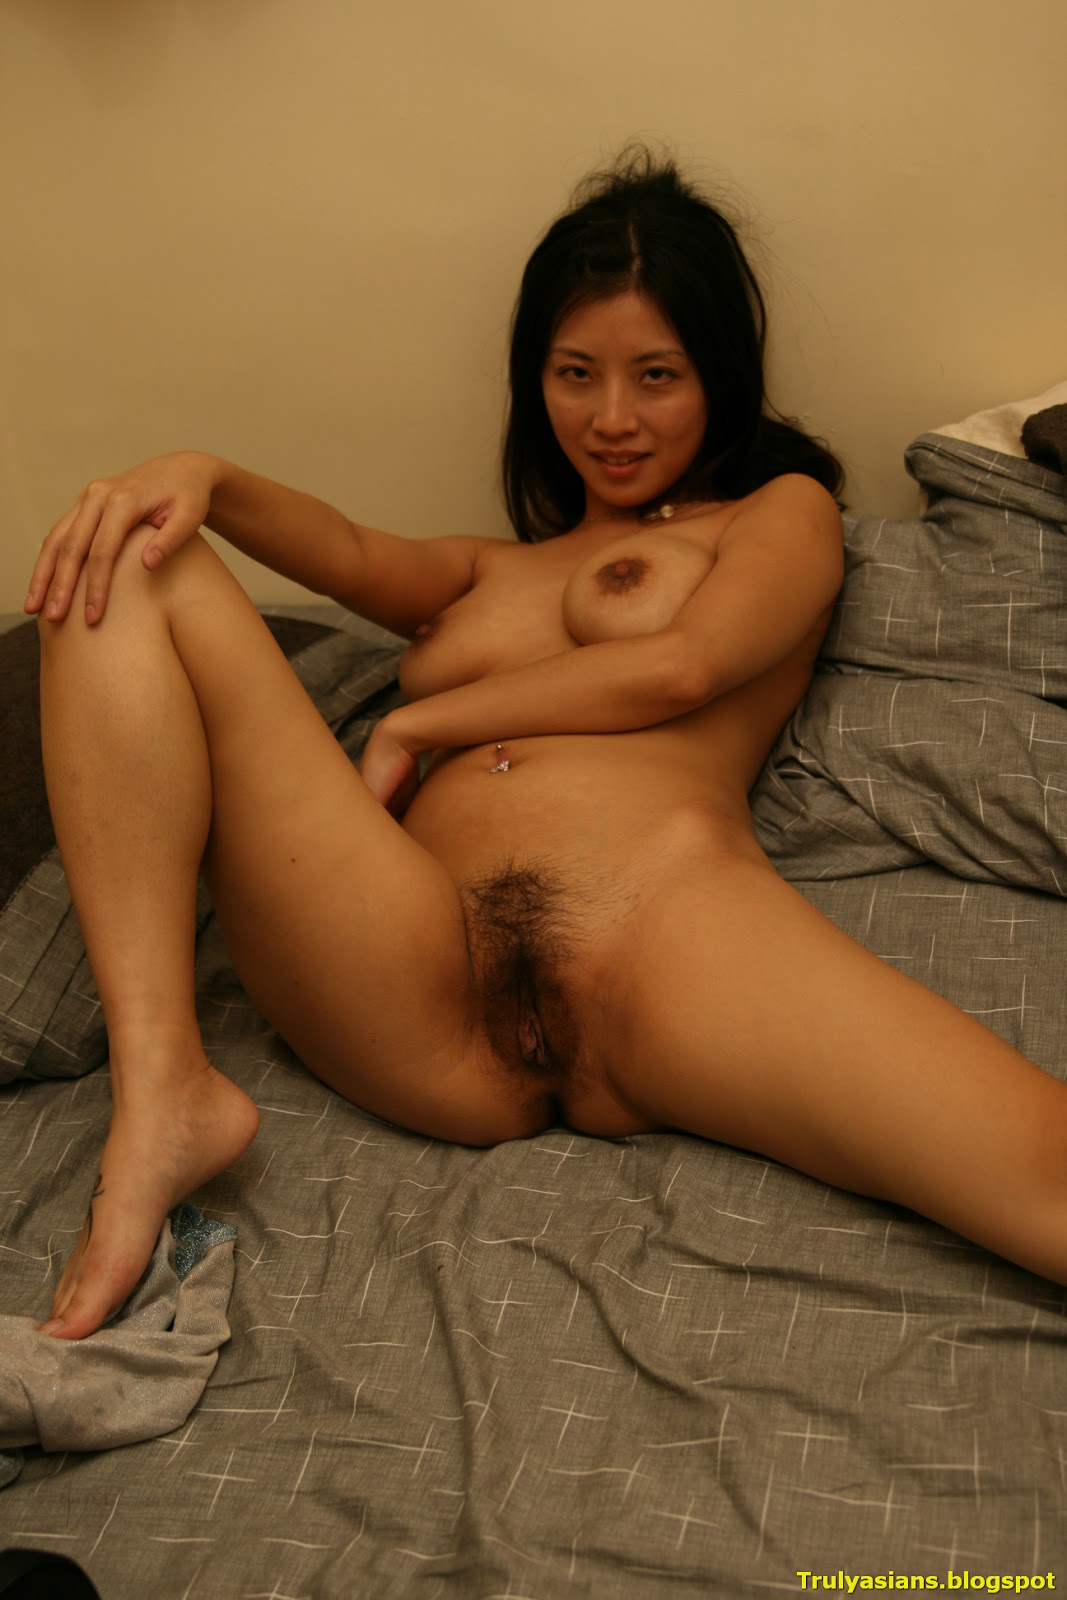 Amateur asian girl sucks and jerks long white cock 10